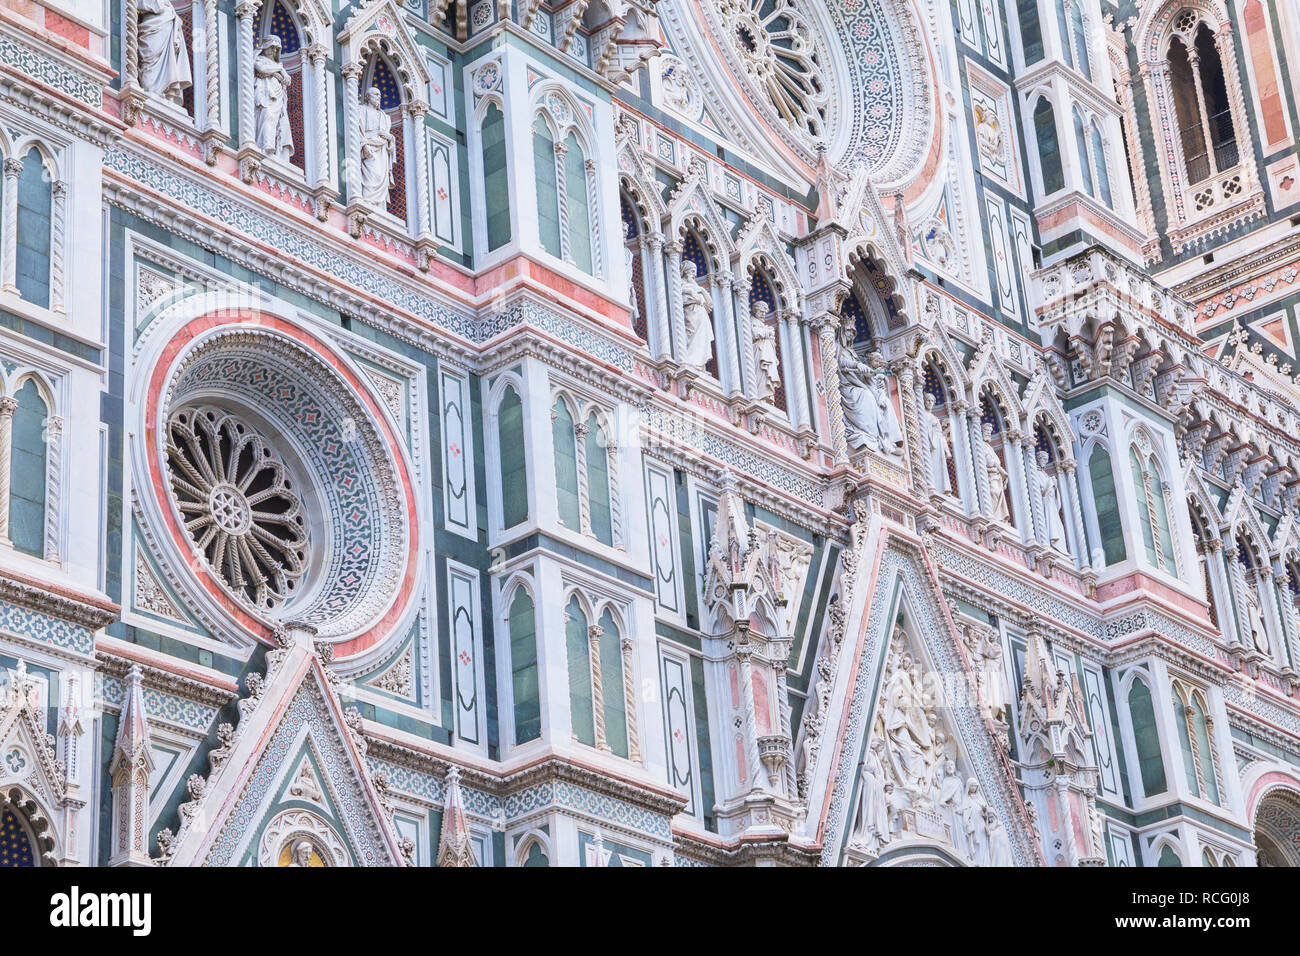 Duomo Santa Maria del Fiore facade, Florence, Tuscany, Italy, Europe - Stock Image